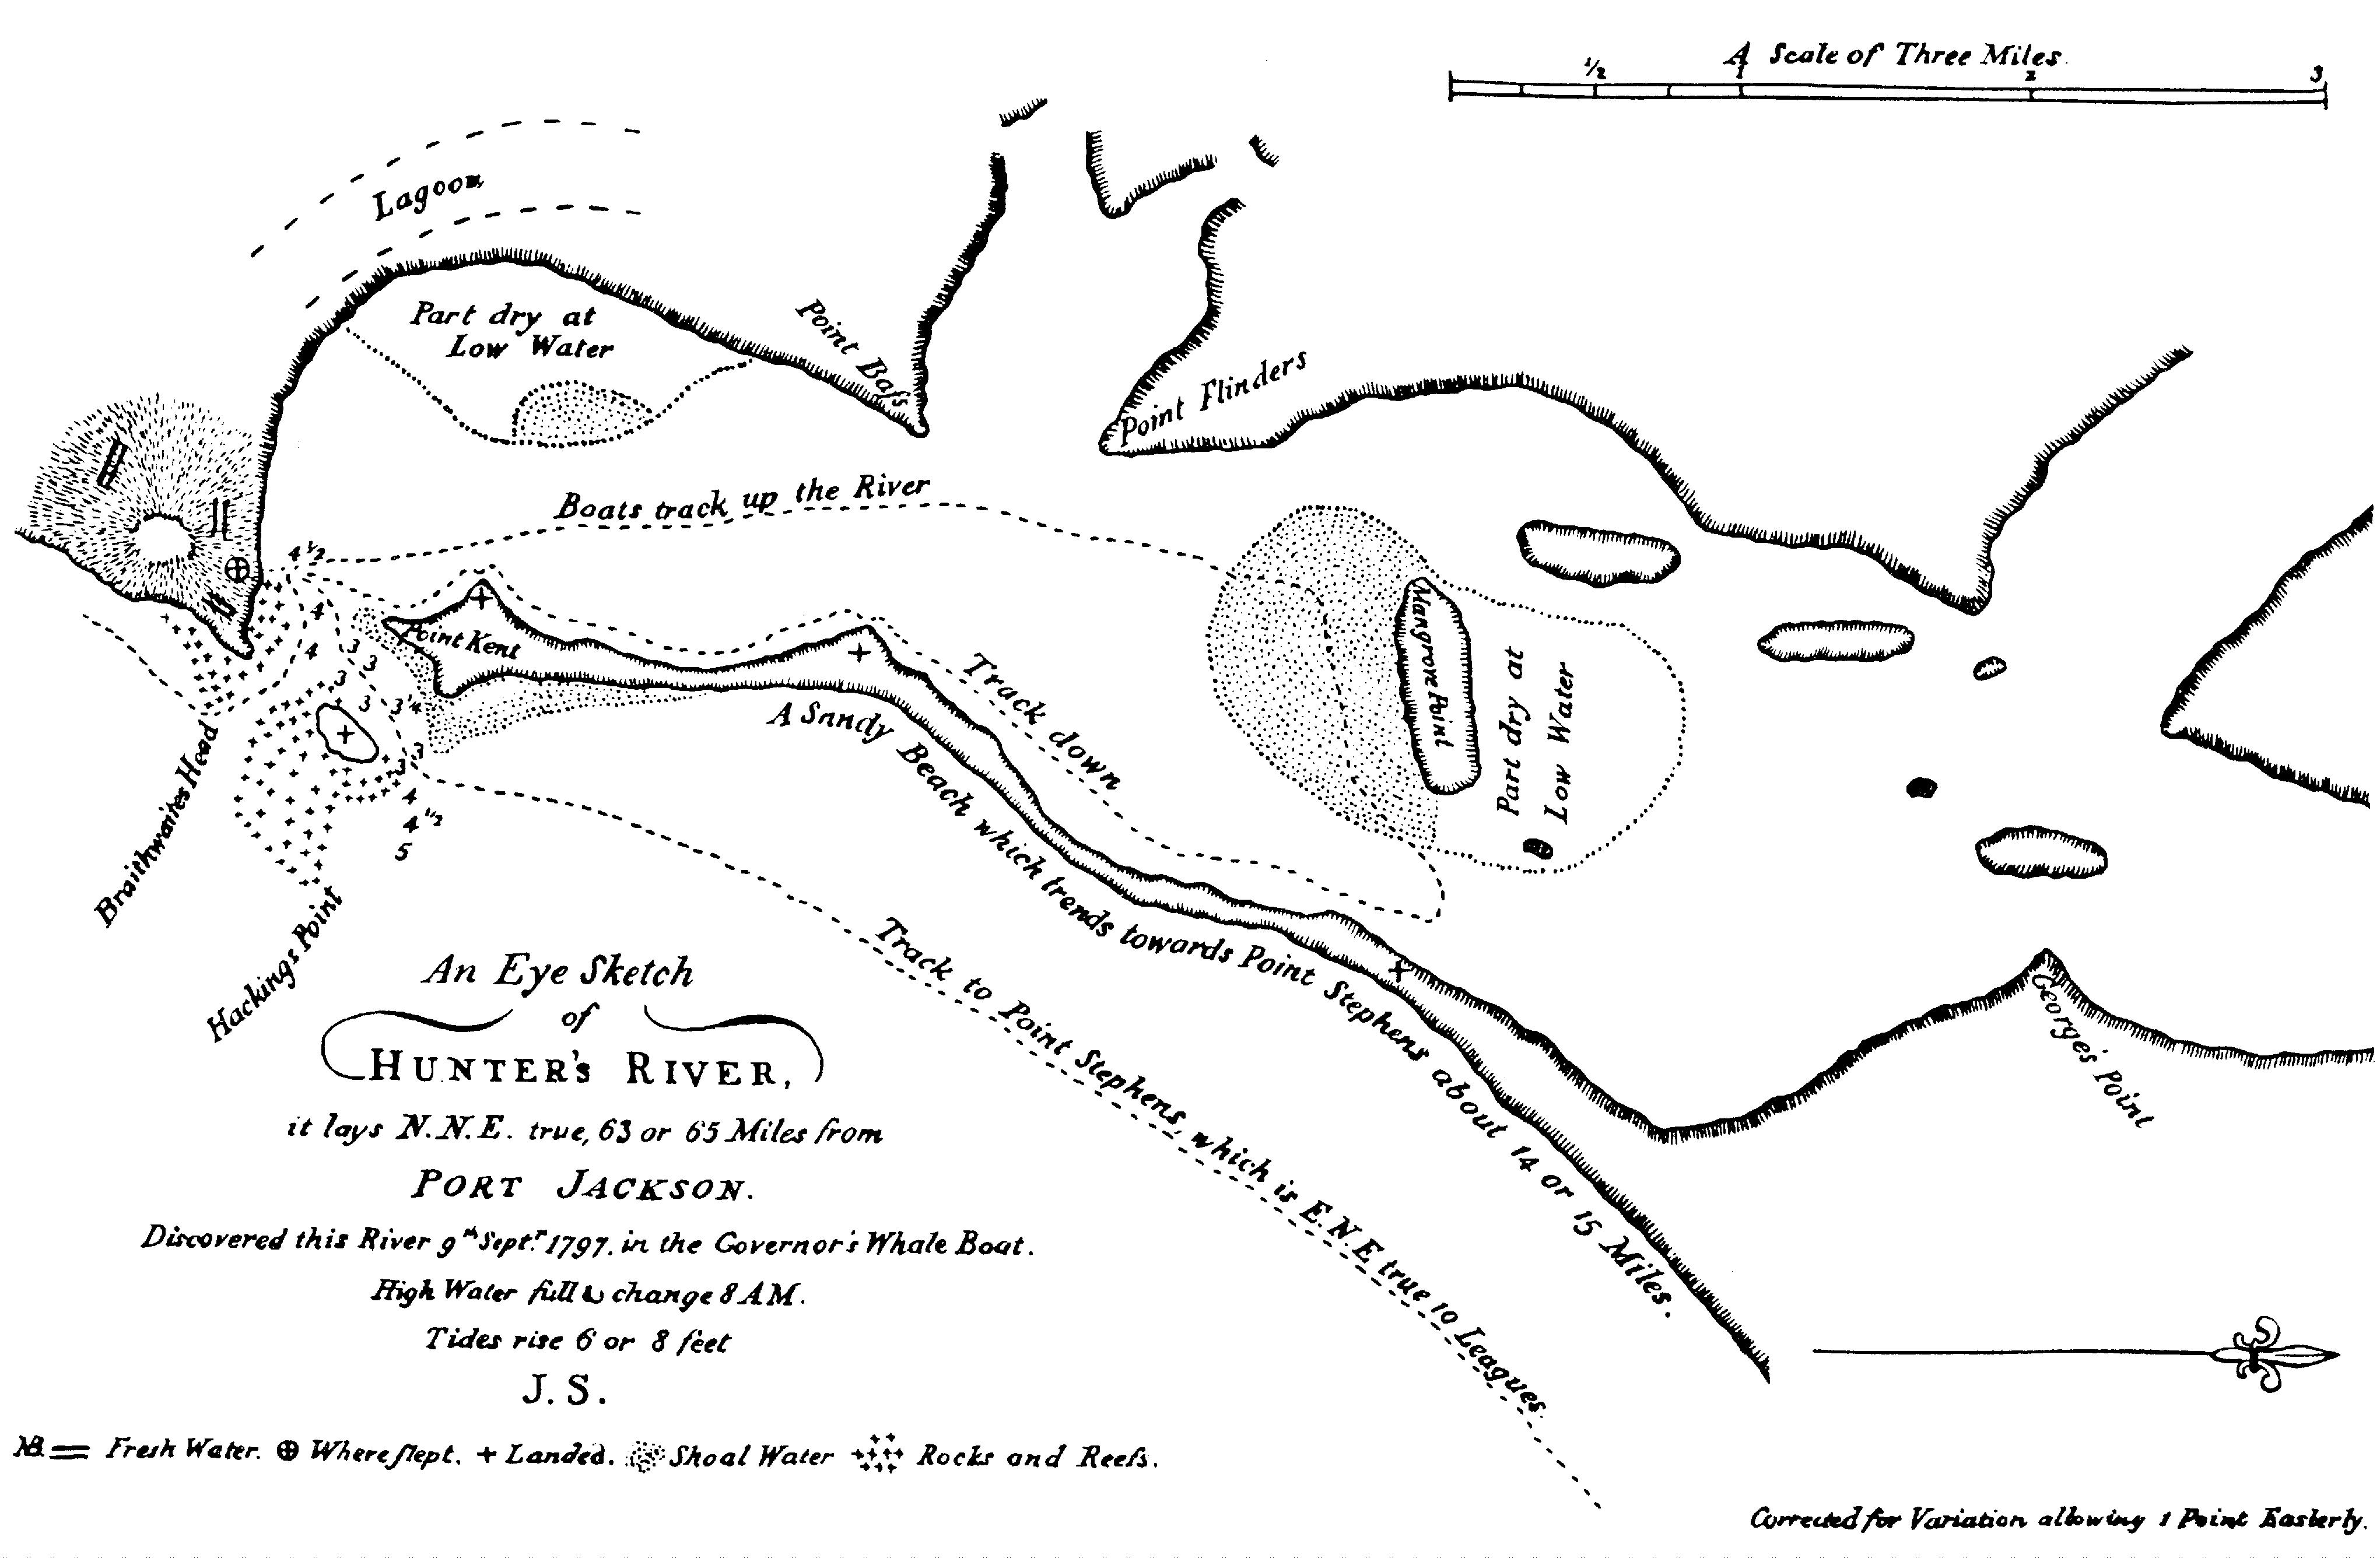 Lieutenant John Shortland's Eye Sketch of Hunter's River 1797, first published 1810.